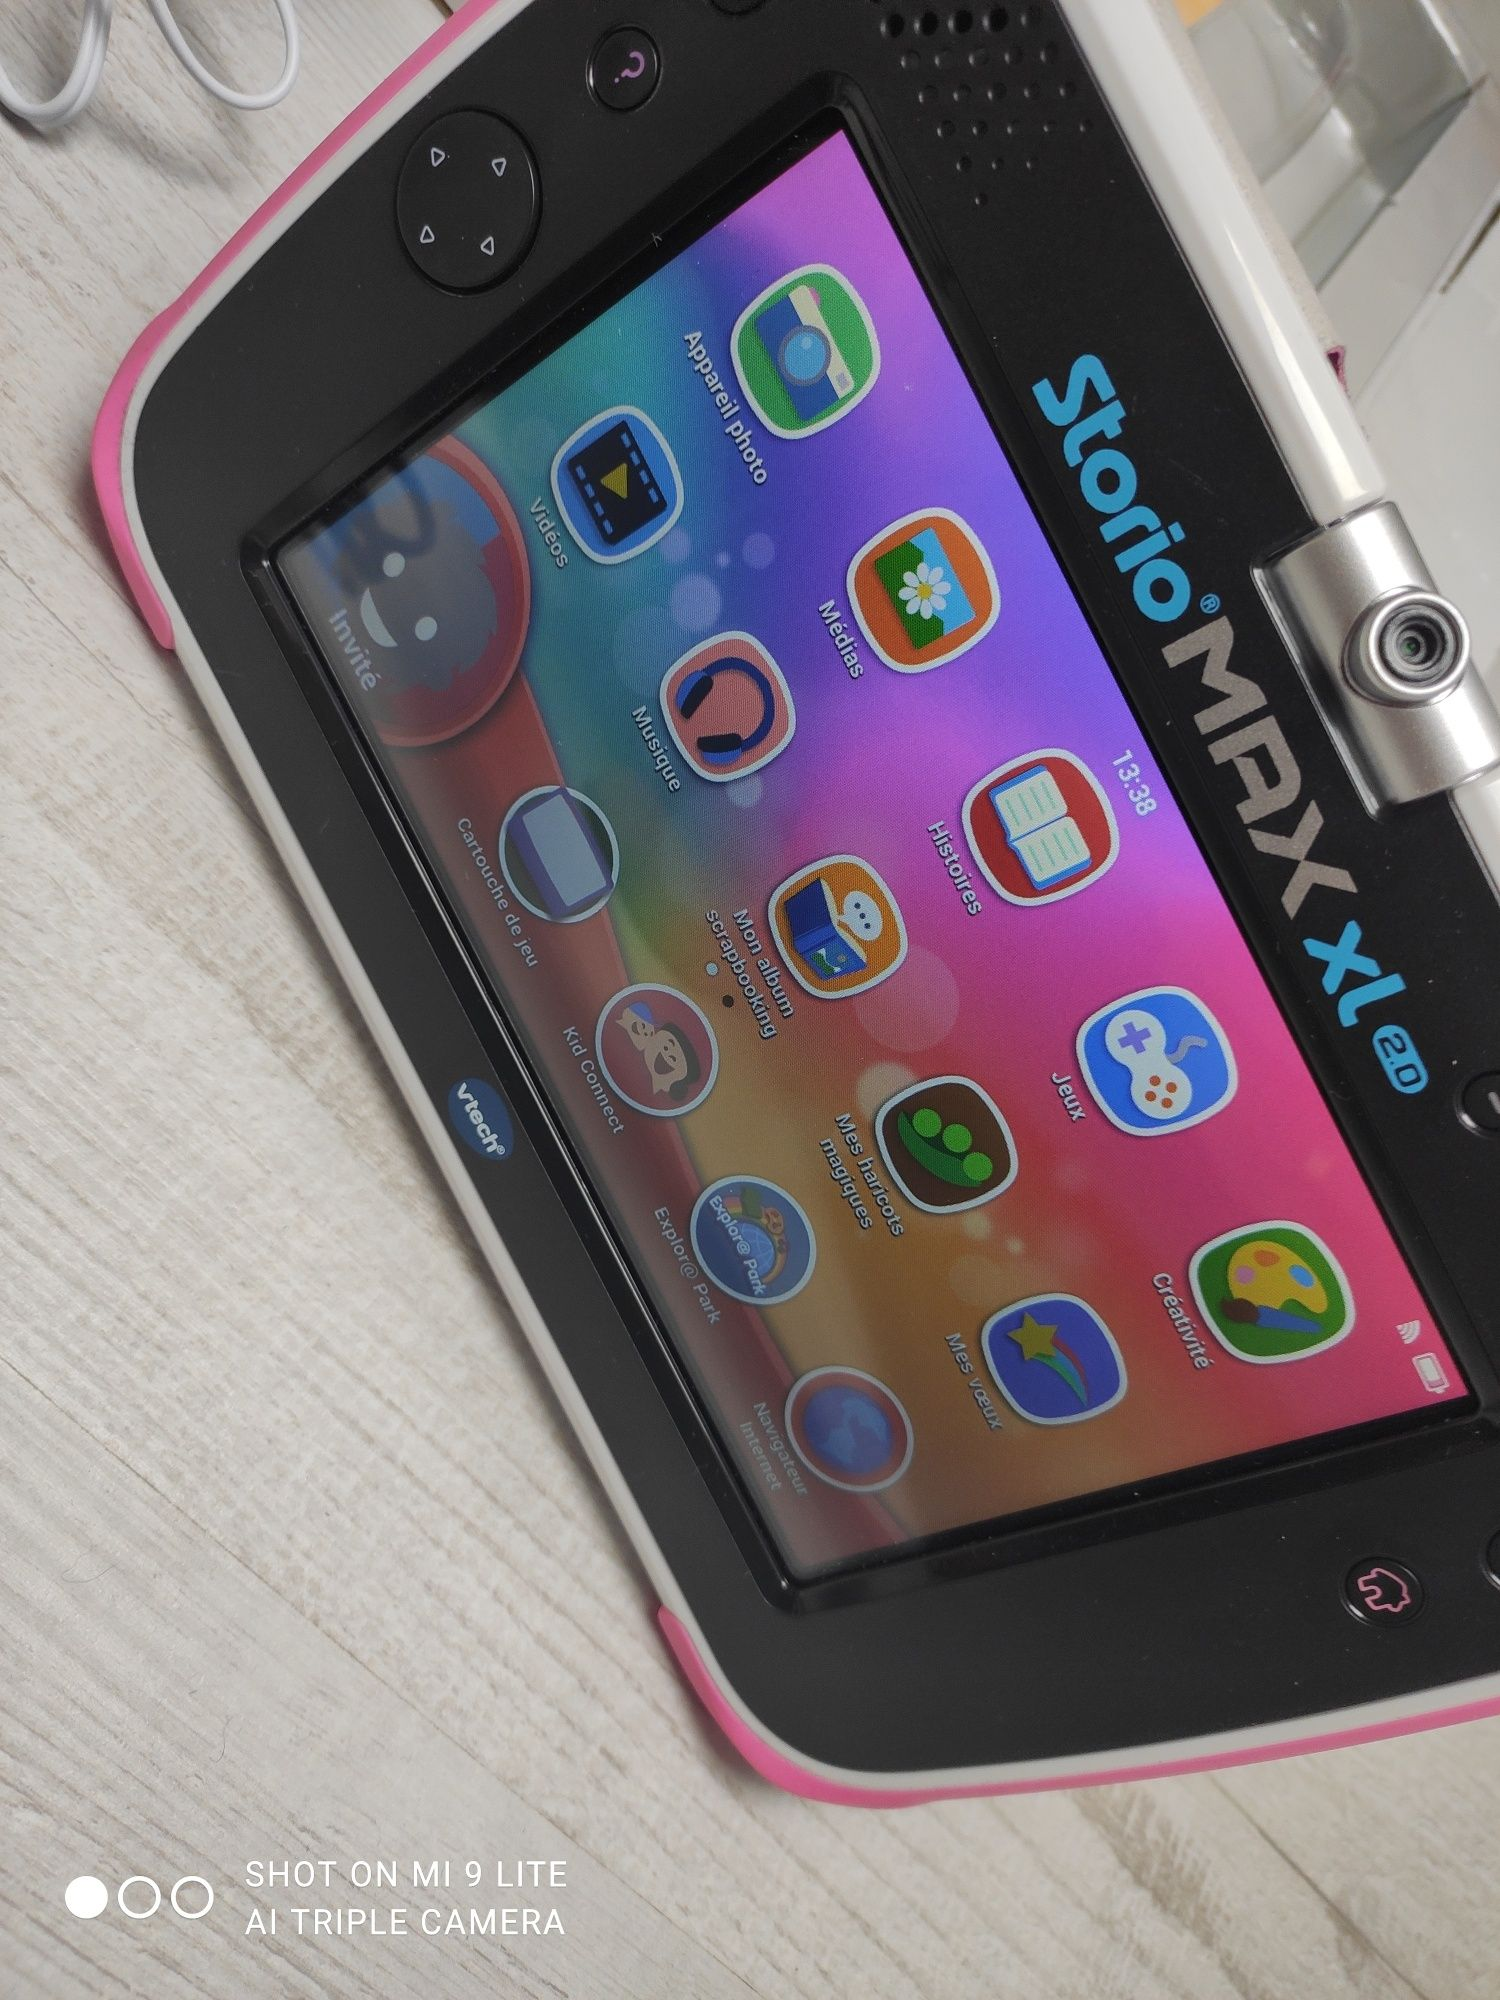 tablet vtech storio max xl 2.0